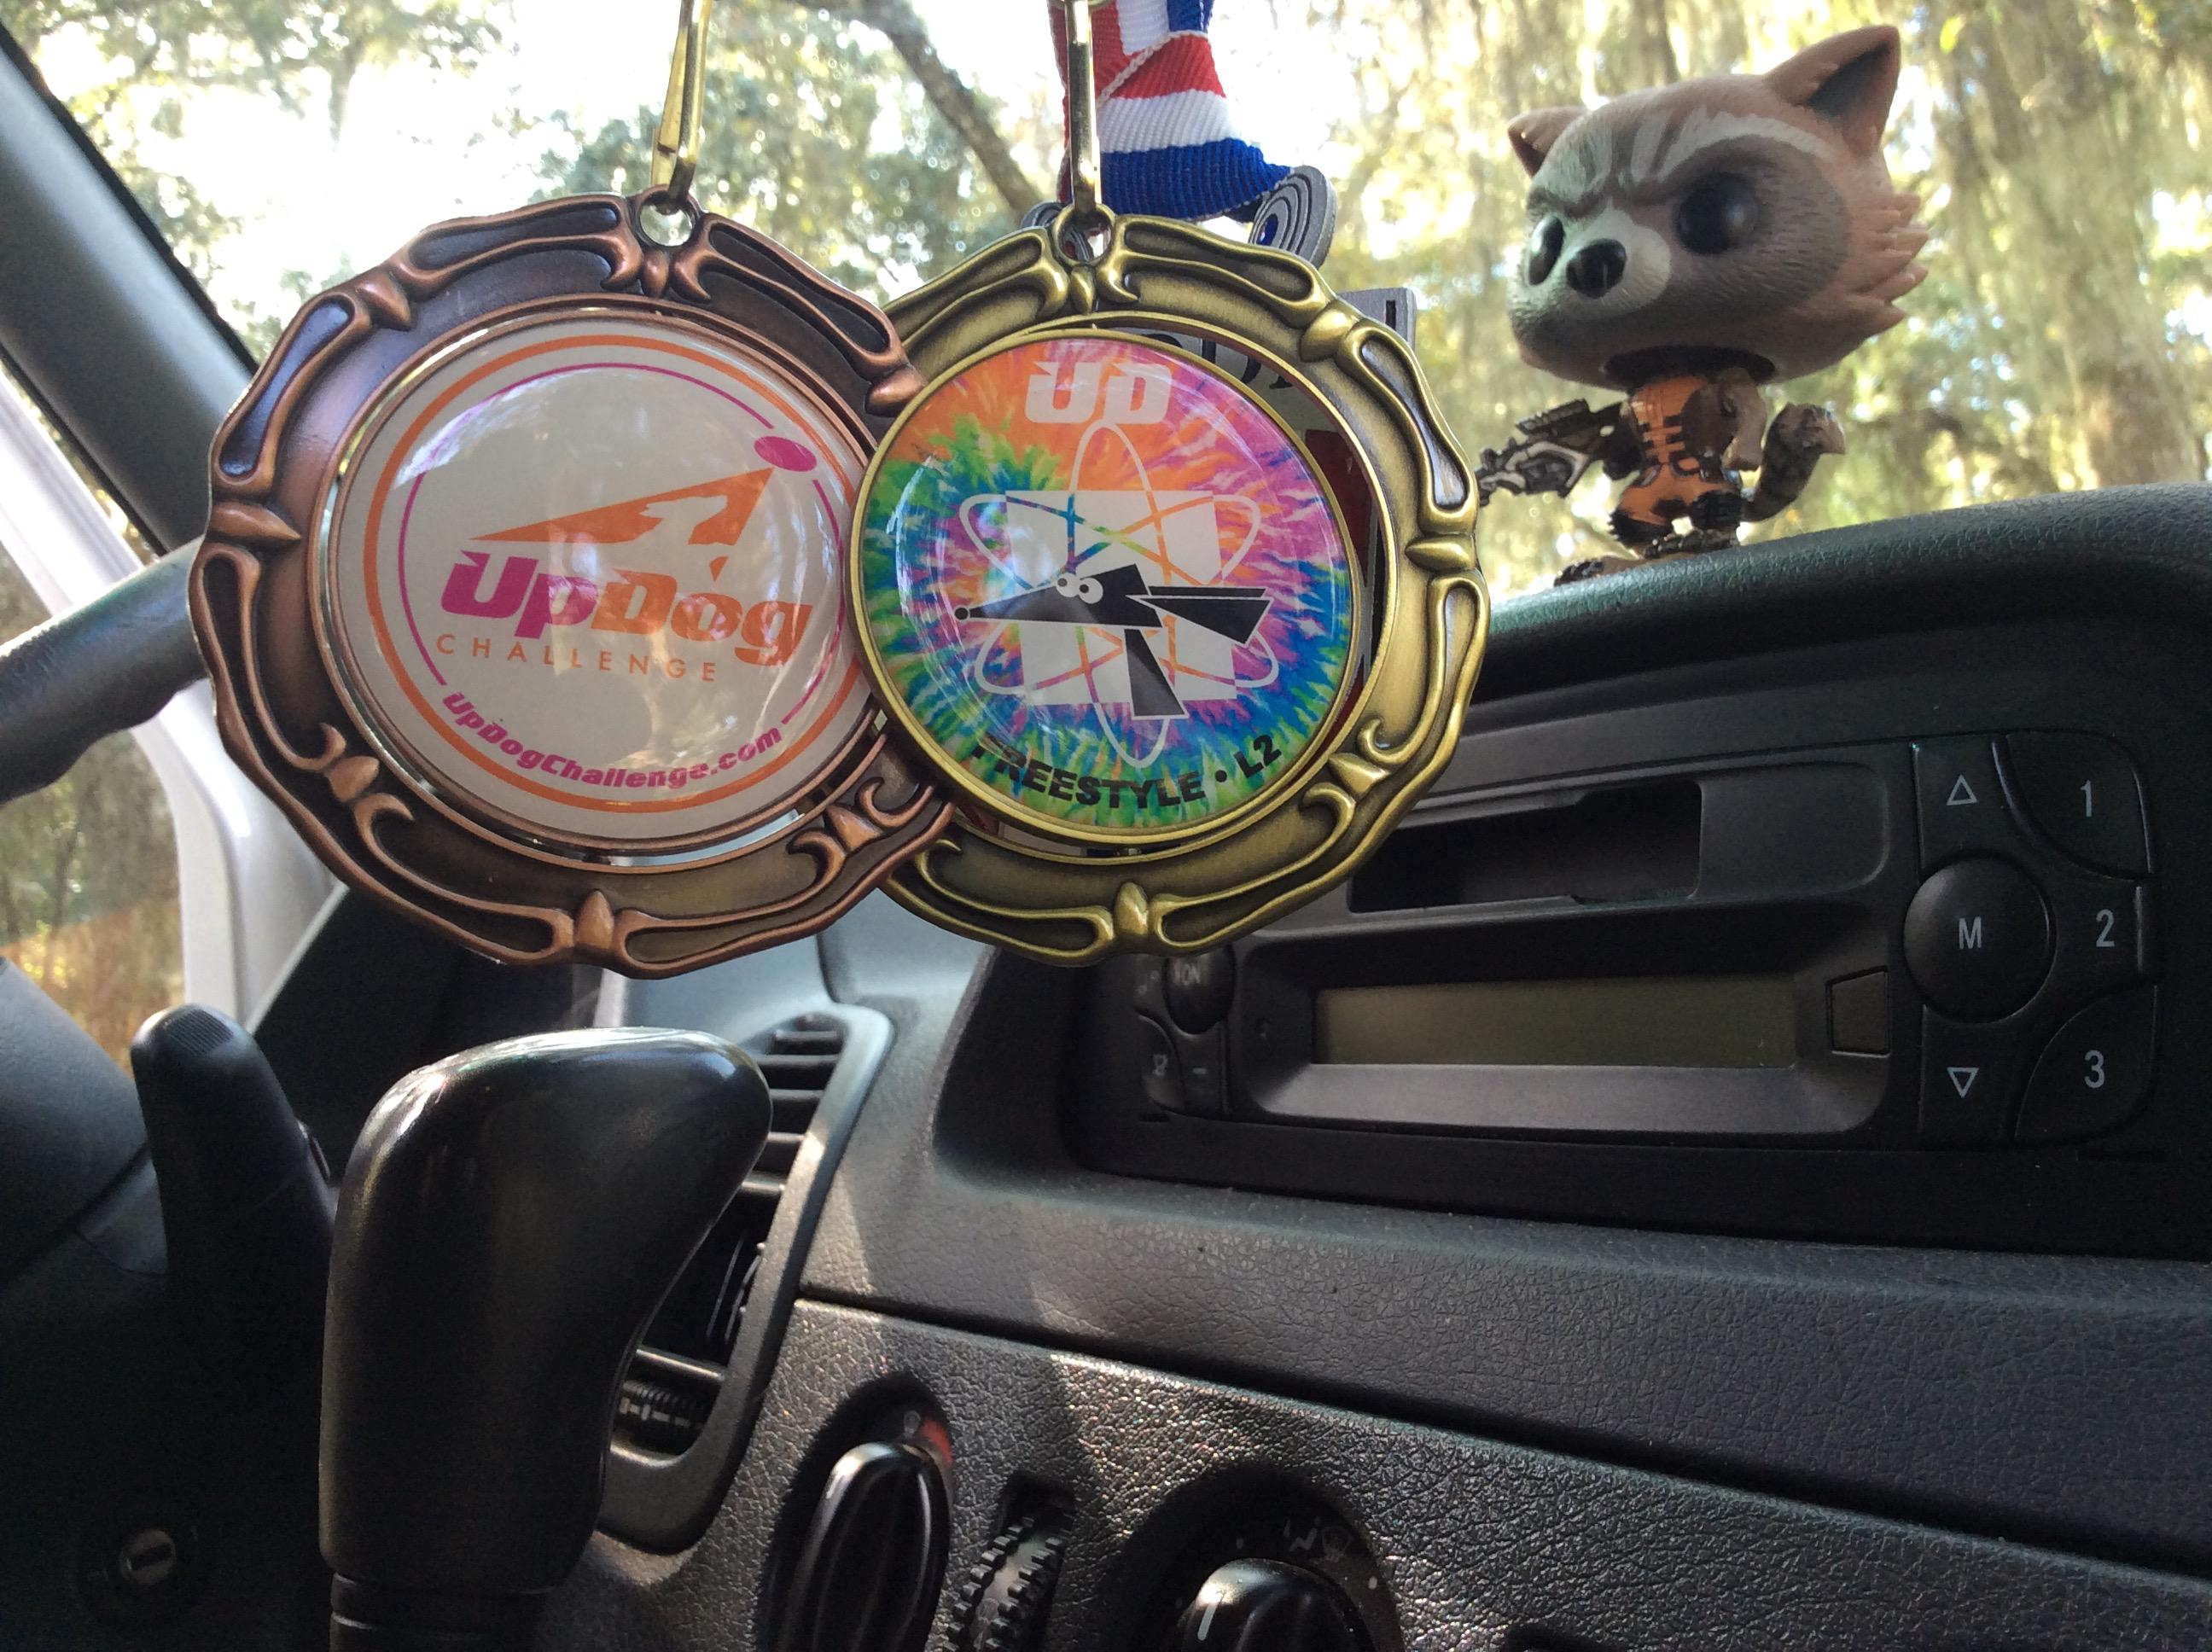 UpDog Freestyle Level 2 Medals